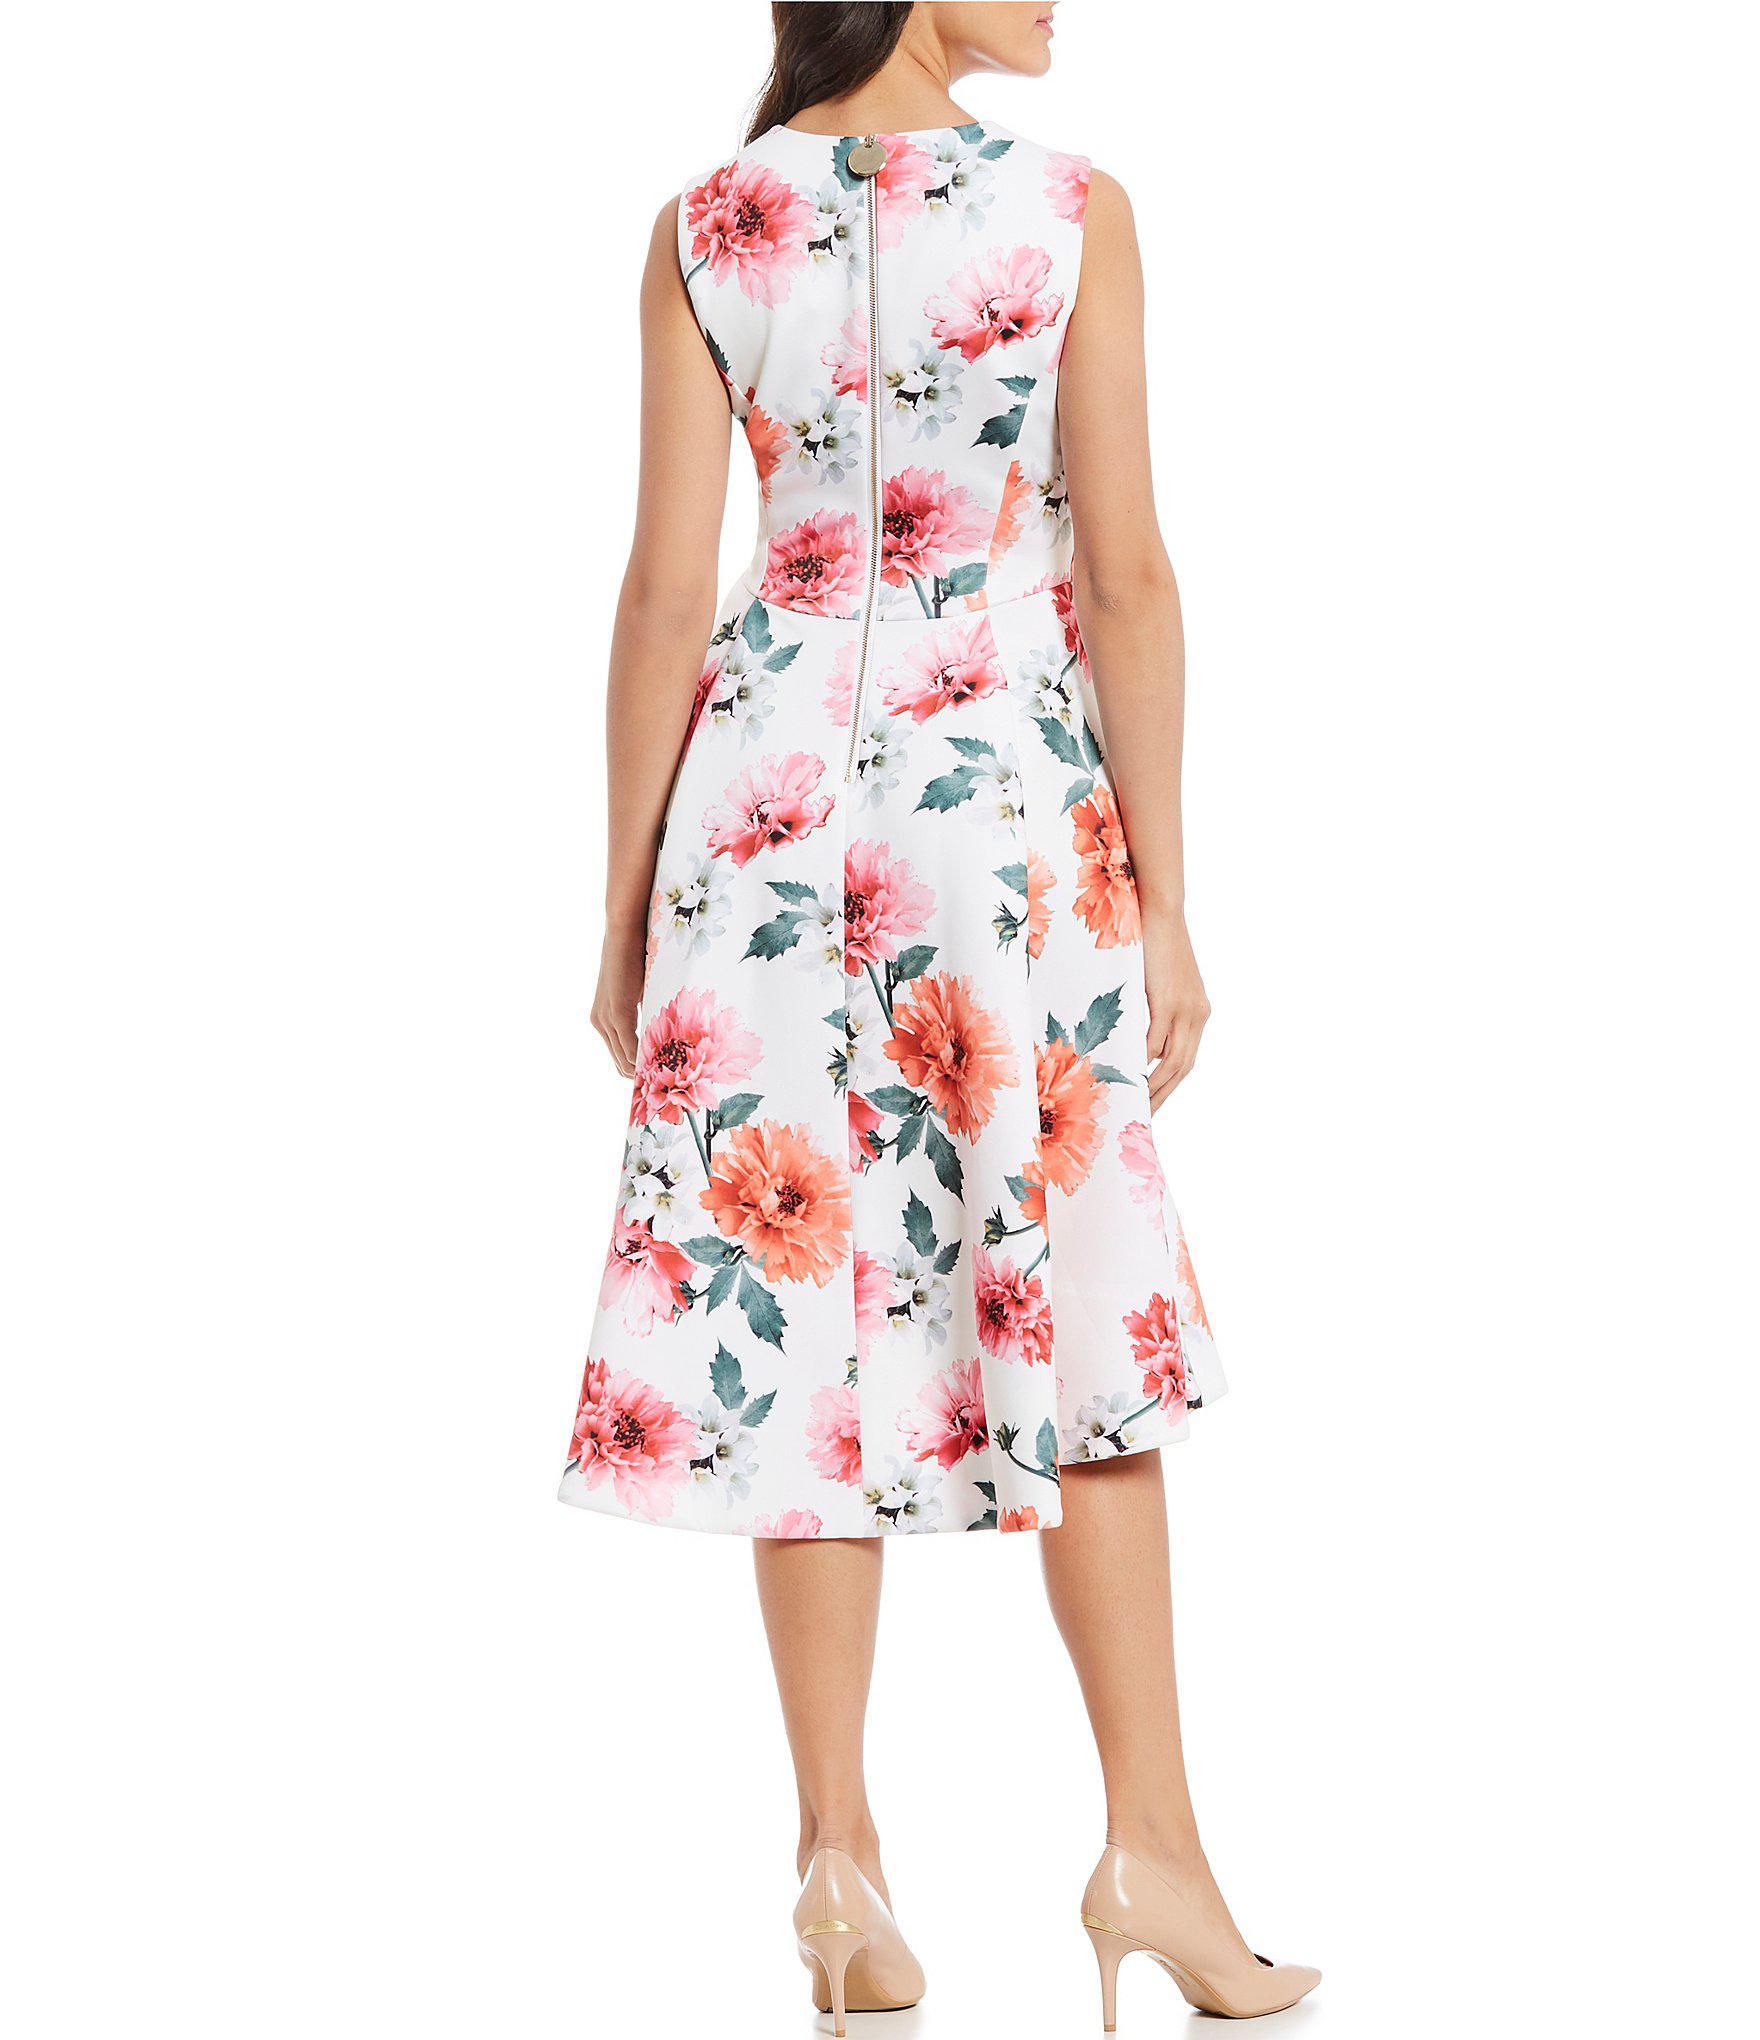 ab2f6dbe79 Calvin Klein Floral Print Hi-low Sleeveless Midi Dress in Red - Lyst